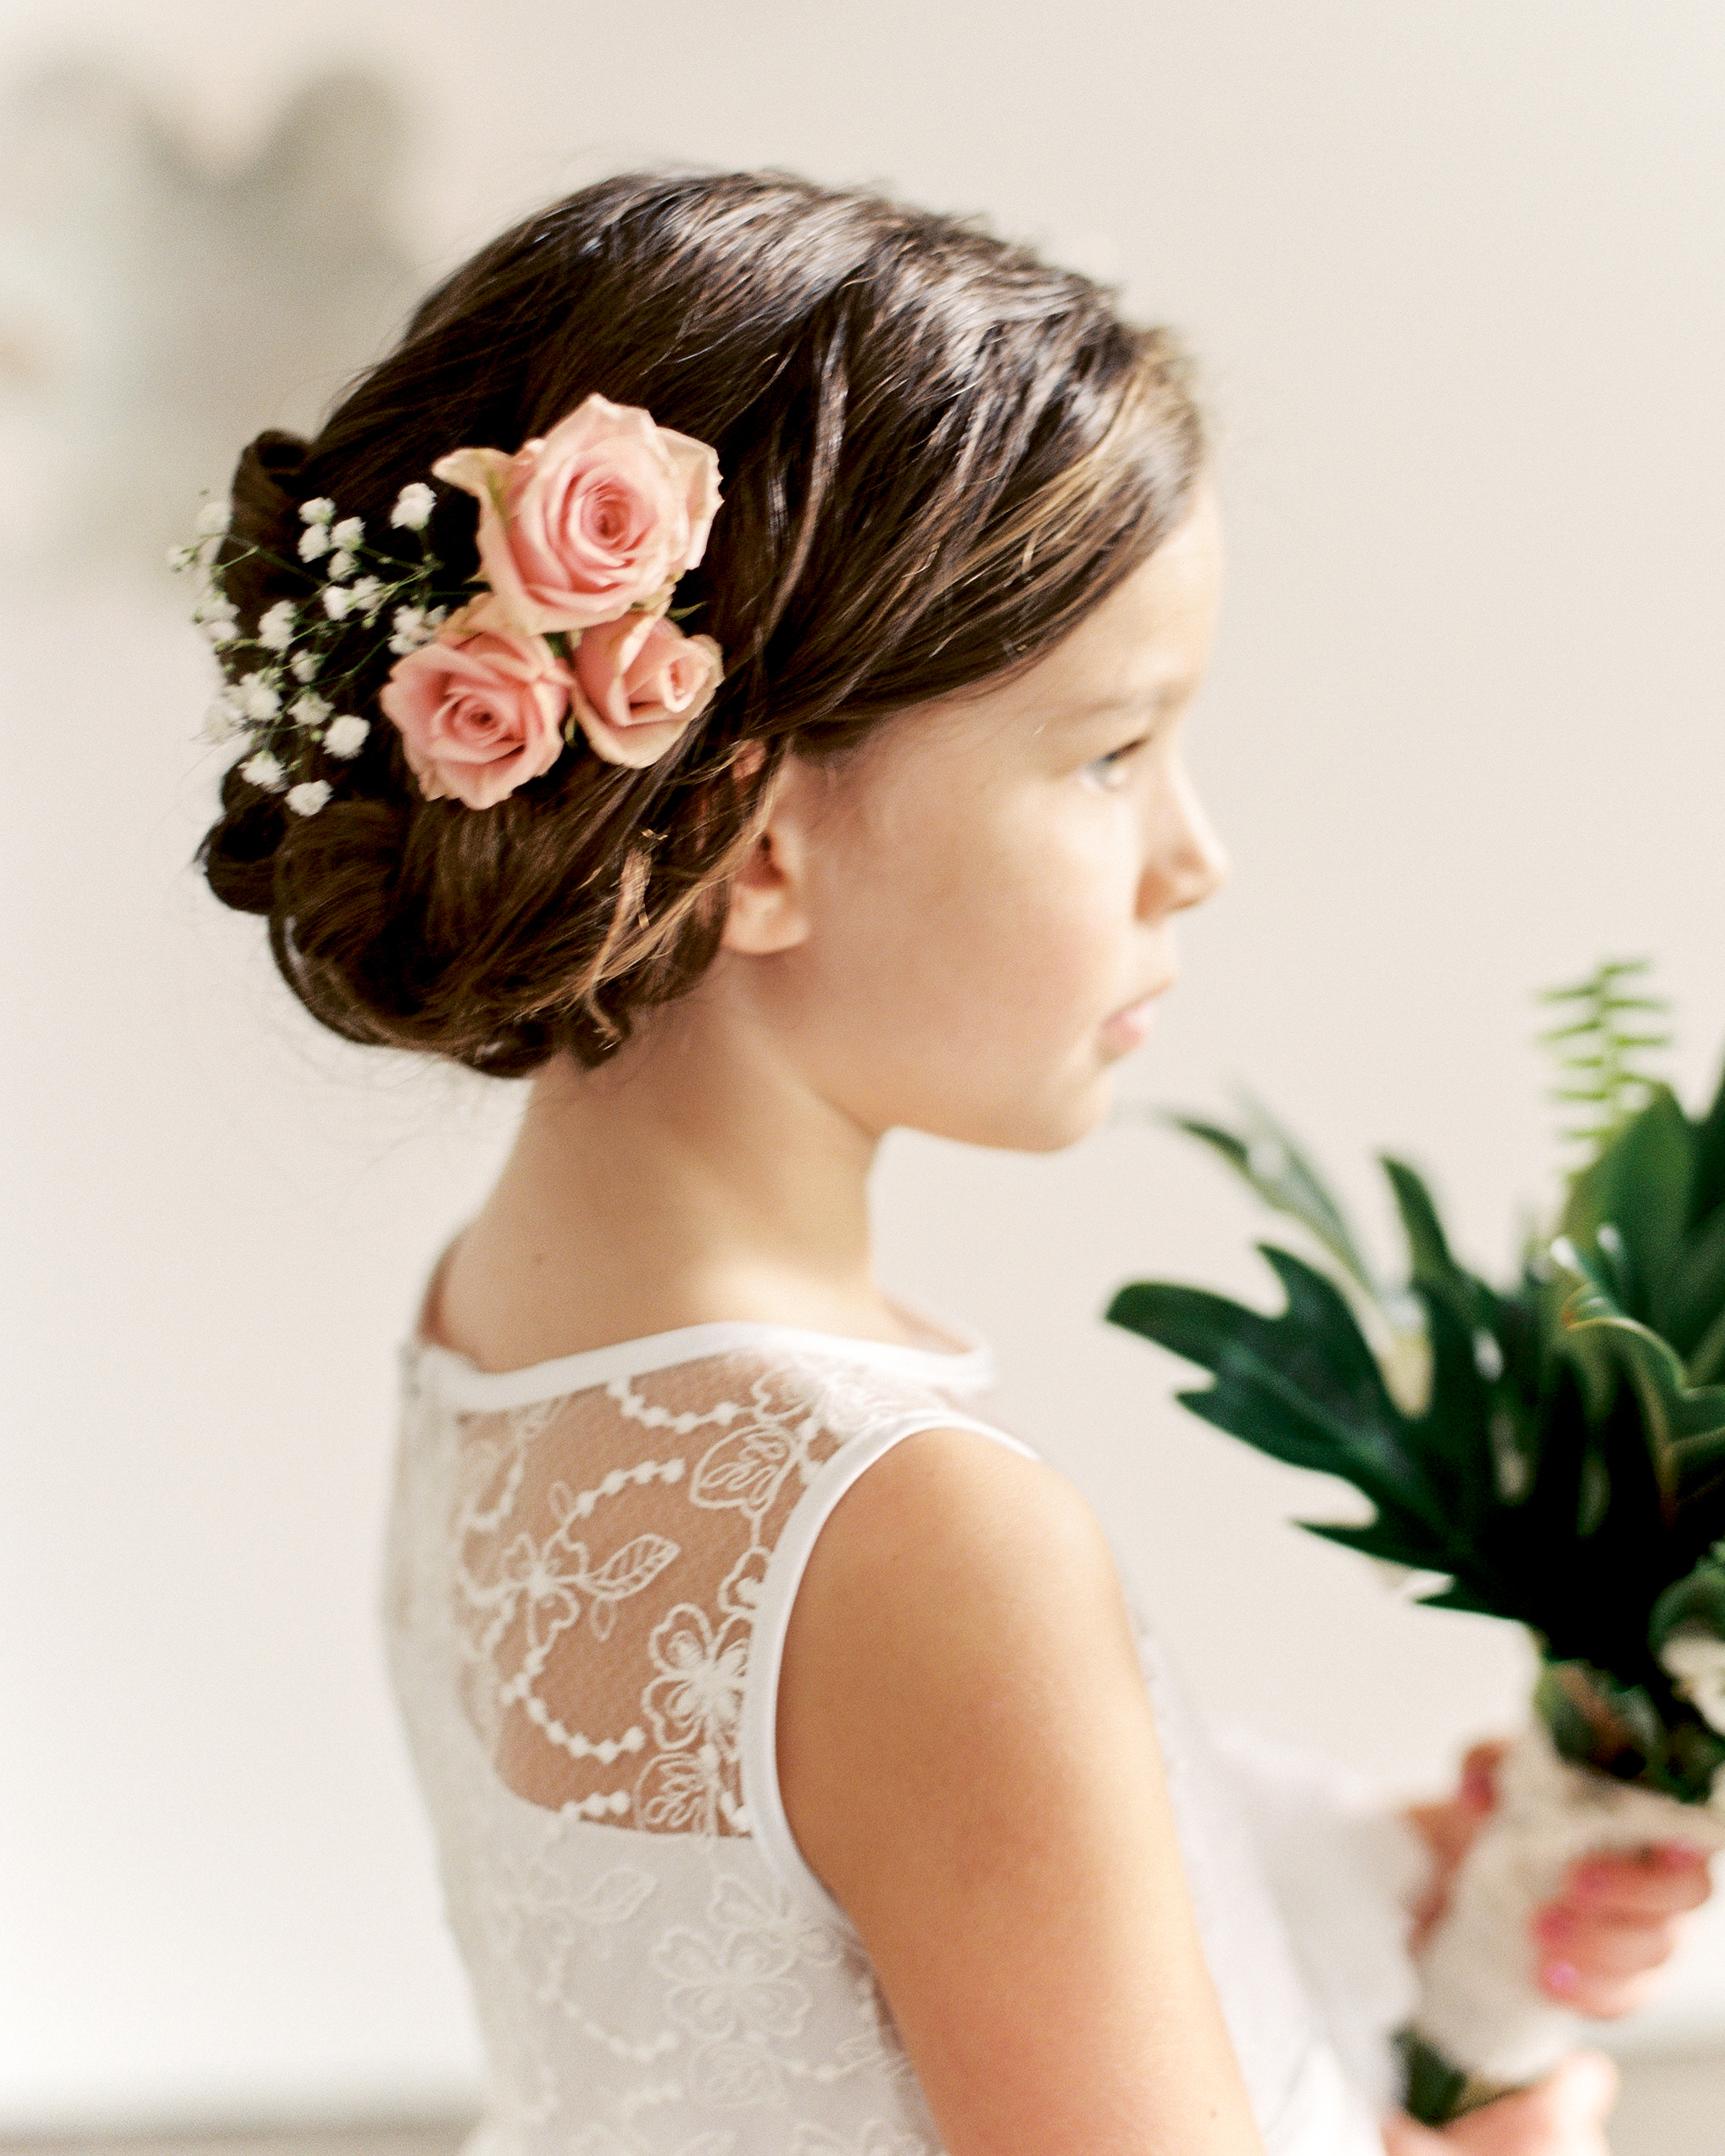 sydney-mike-wedding-flowergirl-112-s111778-0215.jpg